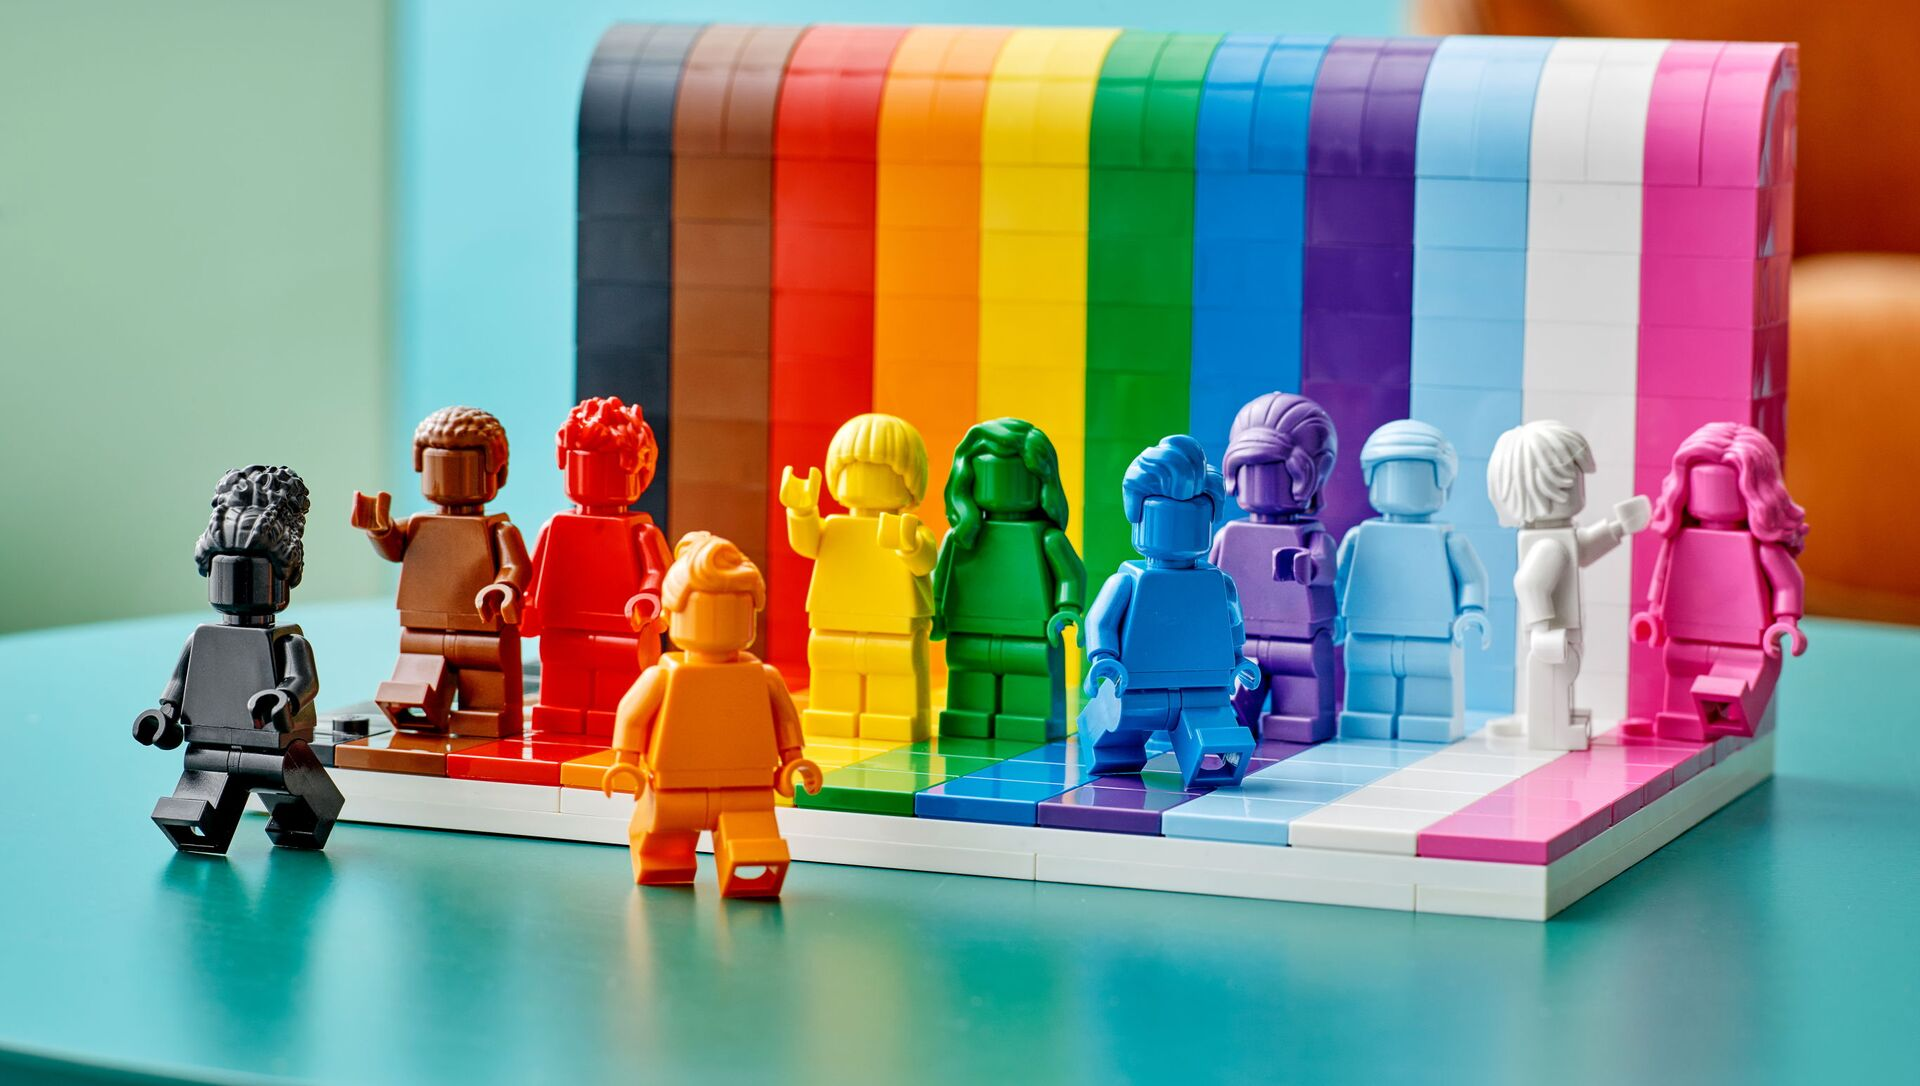 Lego - Sputnik Polska, 1920, 21.05.2021